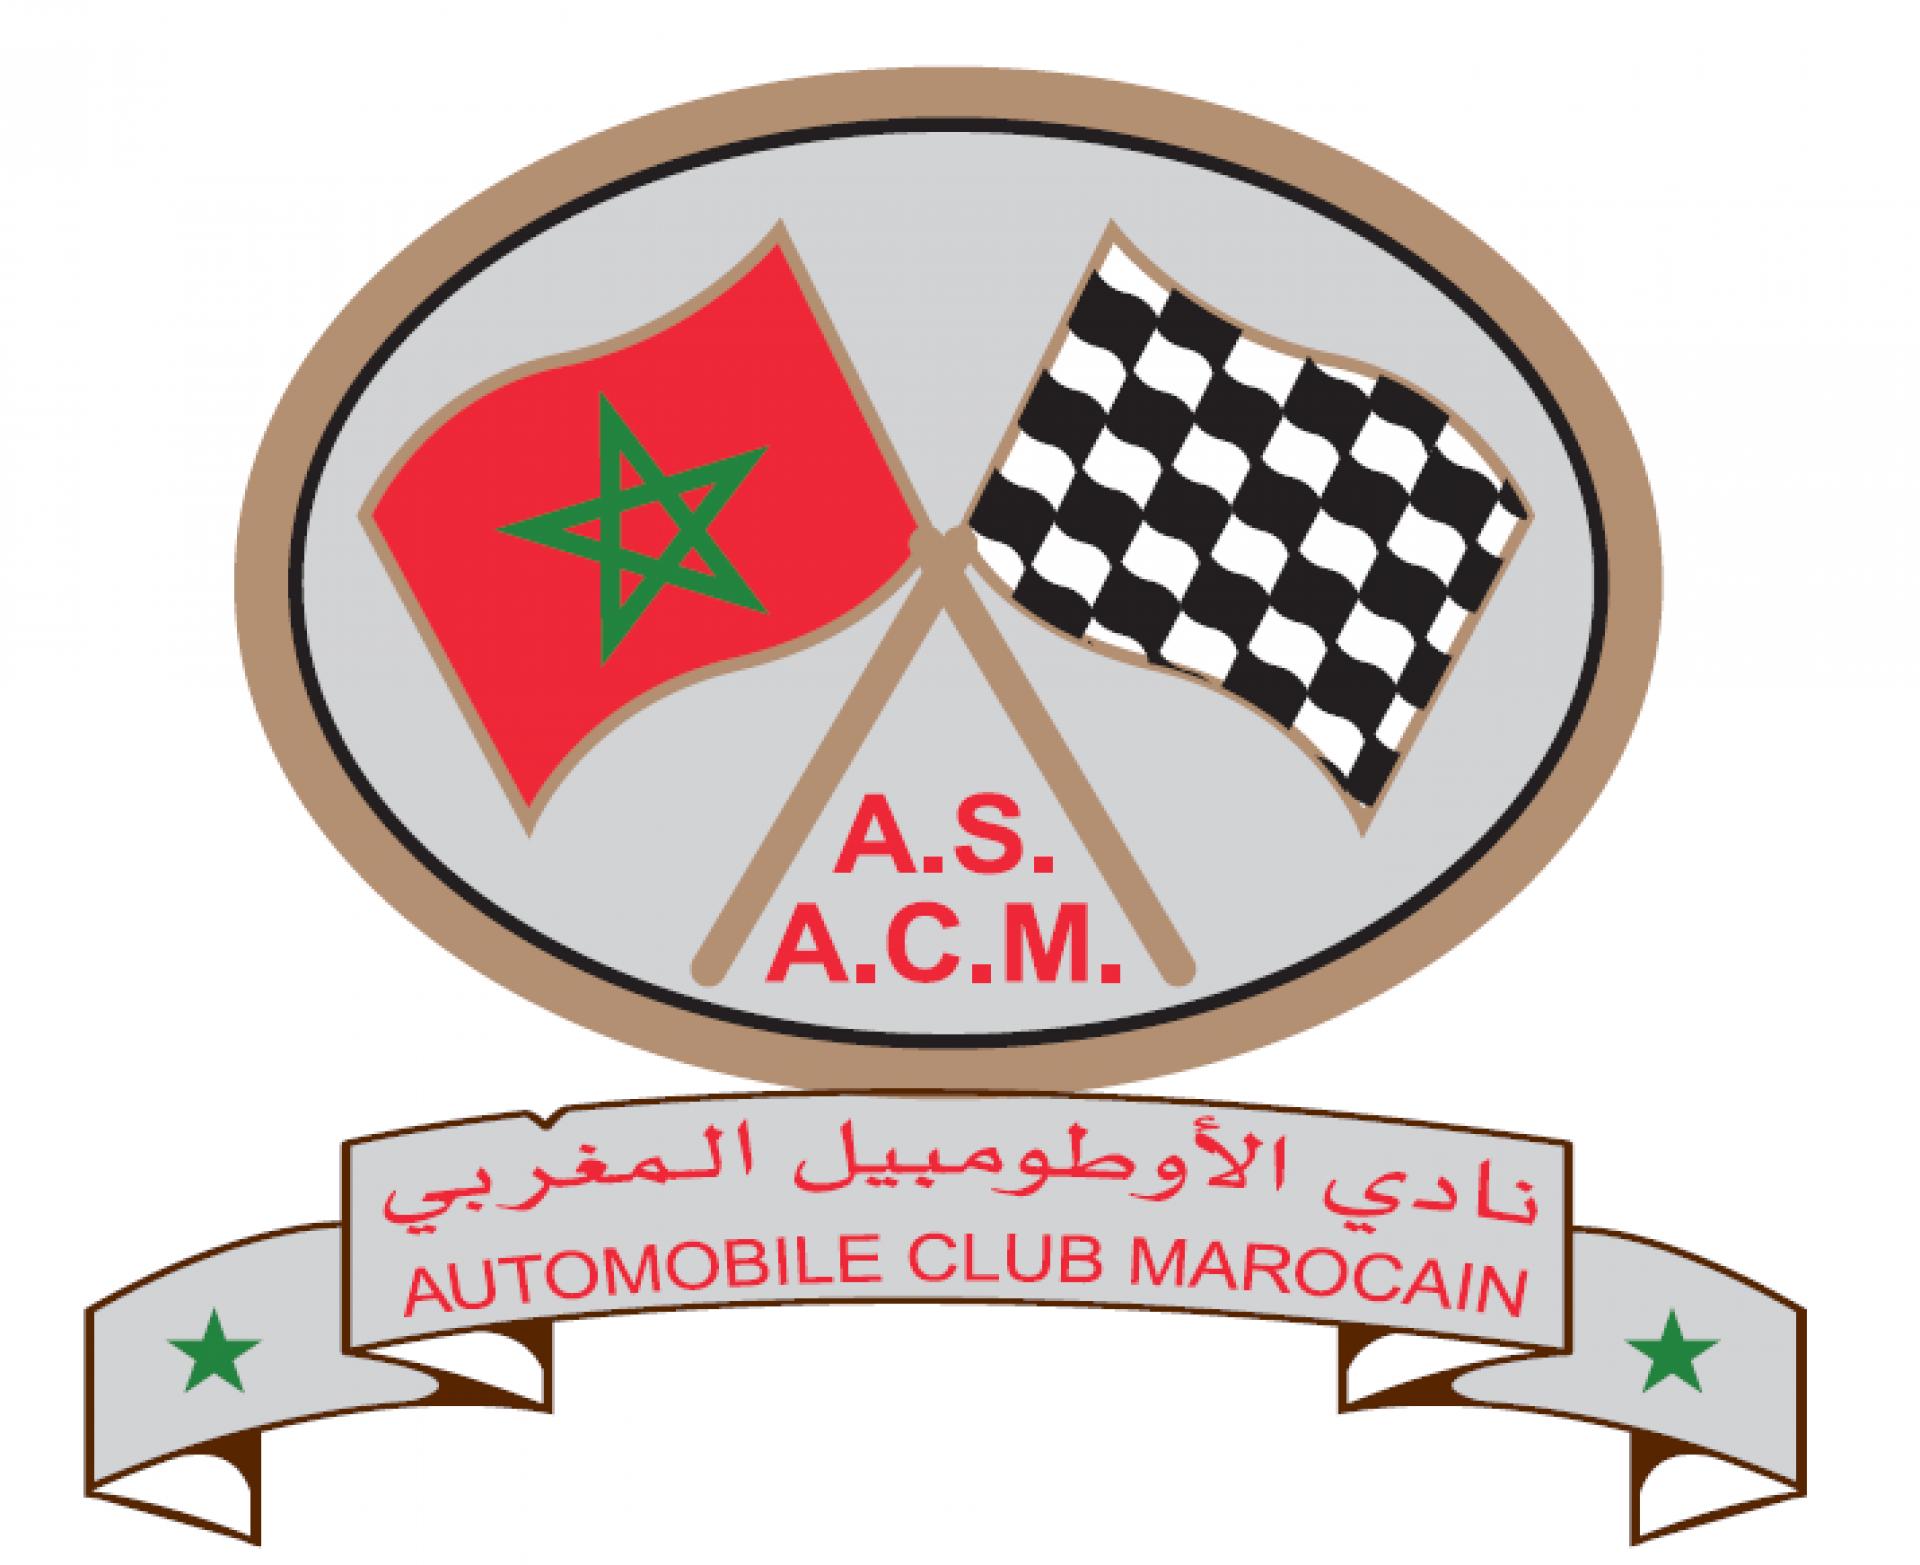 Association Sportive Automobile Club Marocain (ASACM) logo